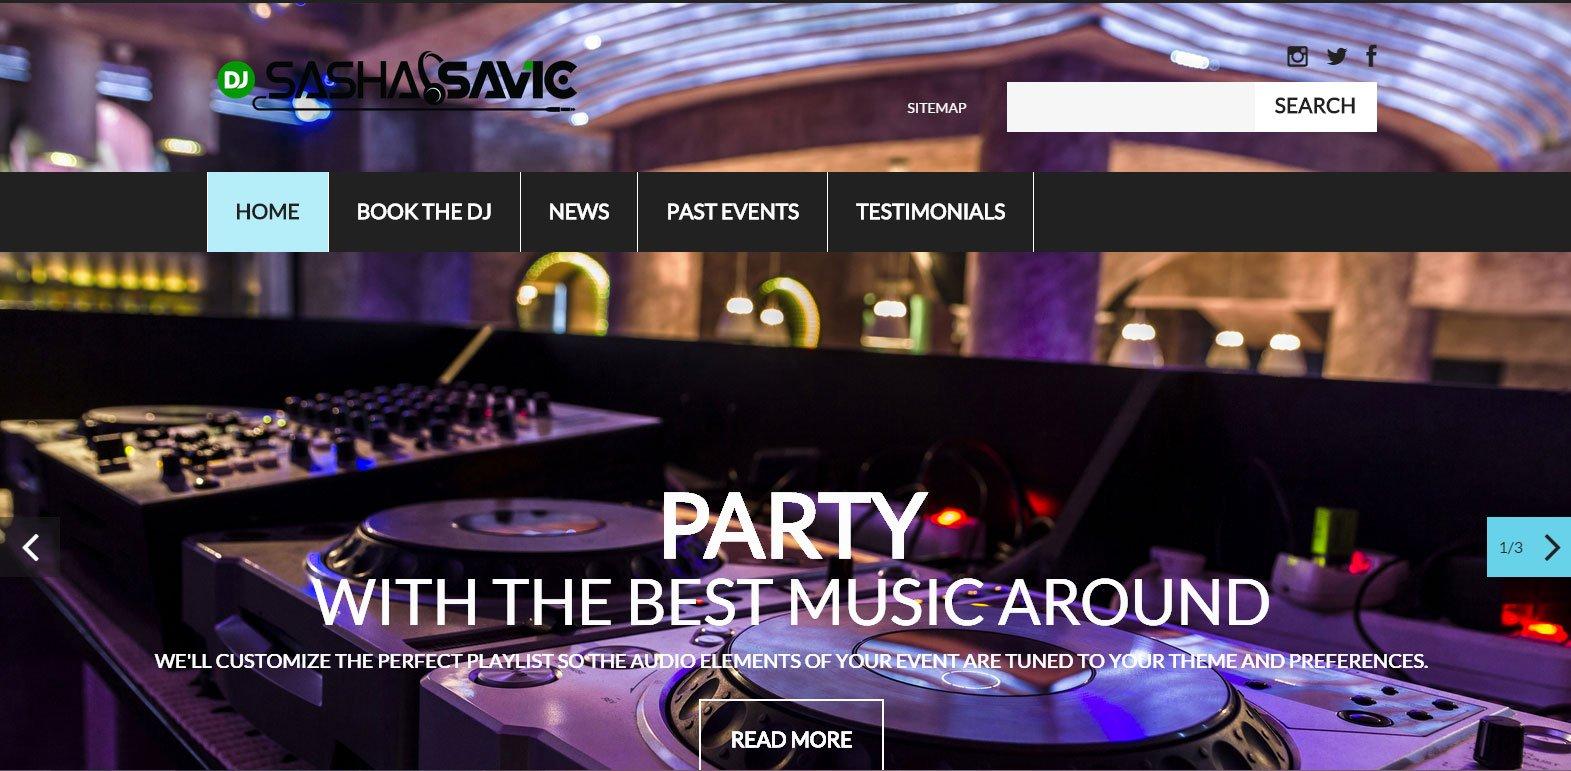 DJ Sasha Savic